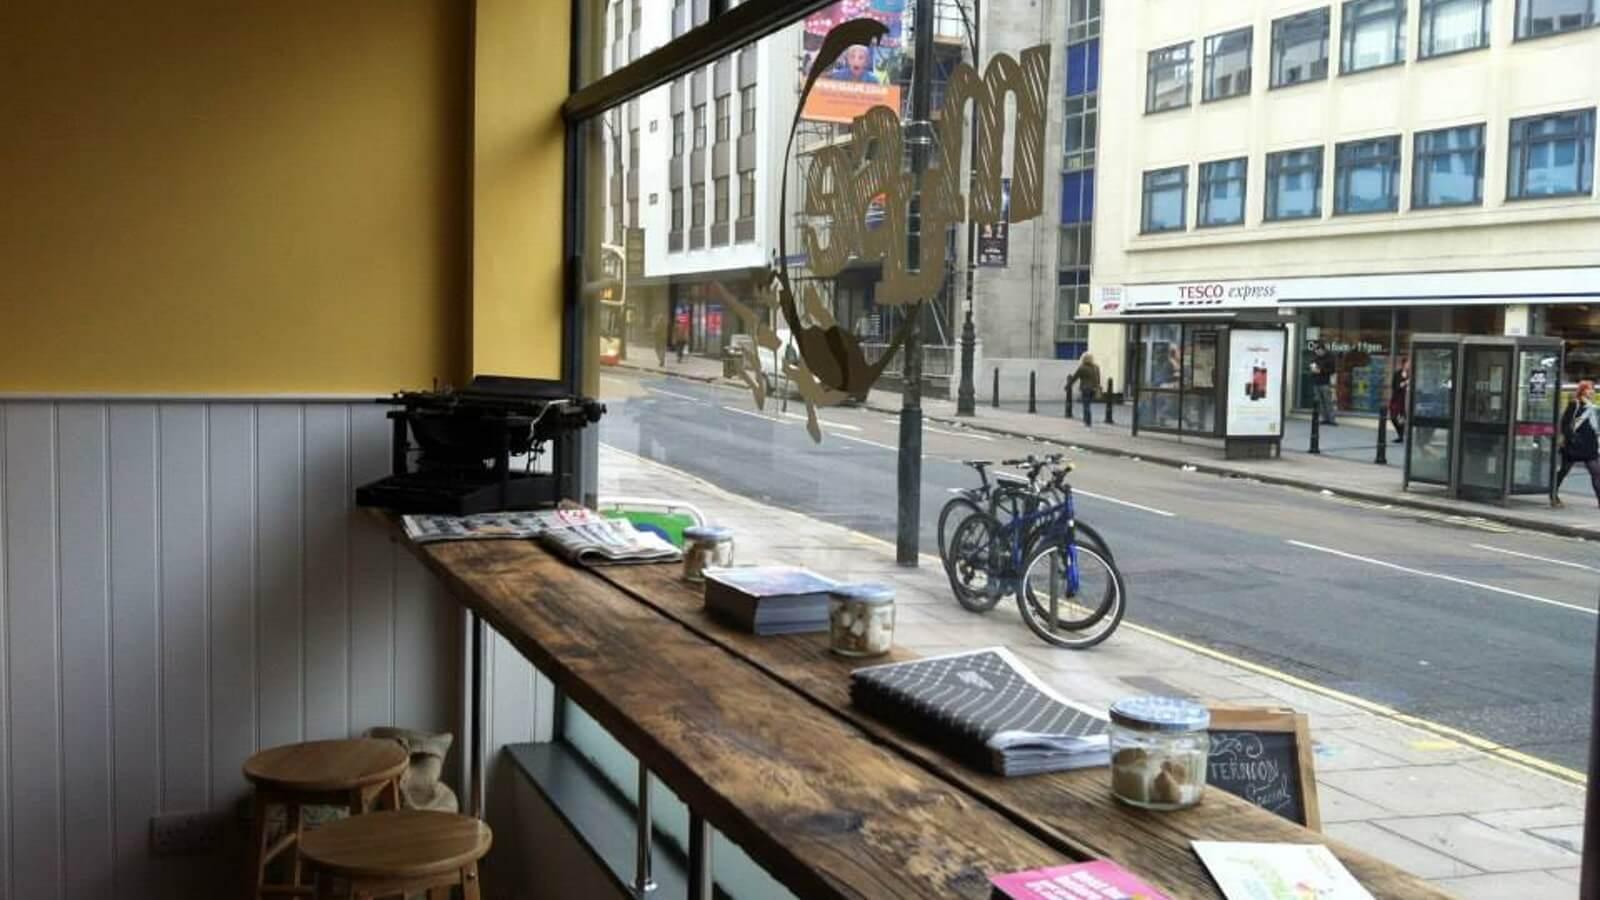 MUSE Cafe